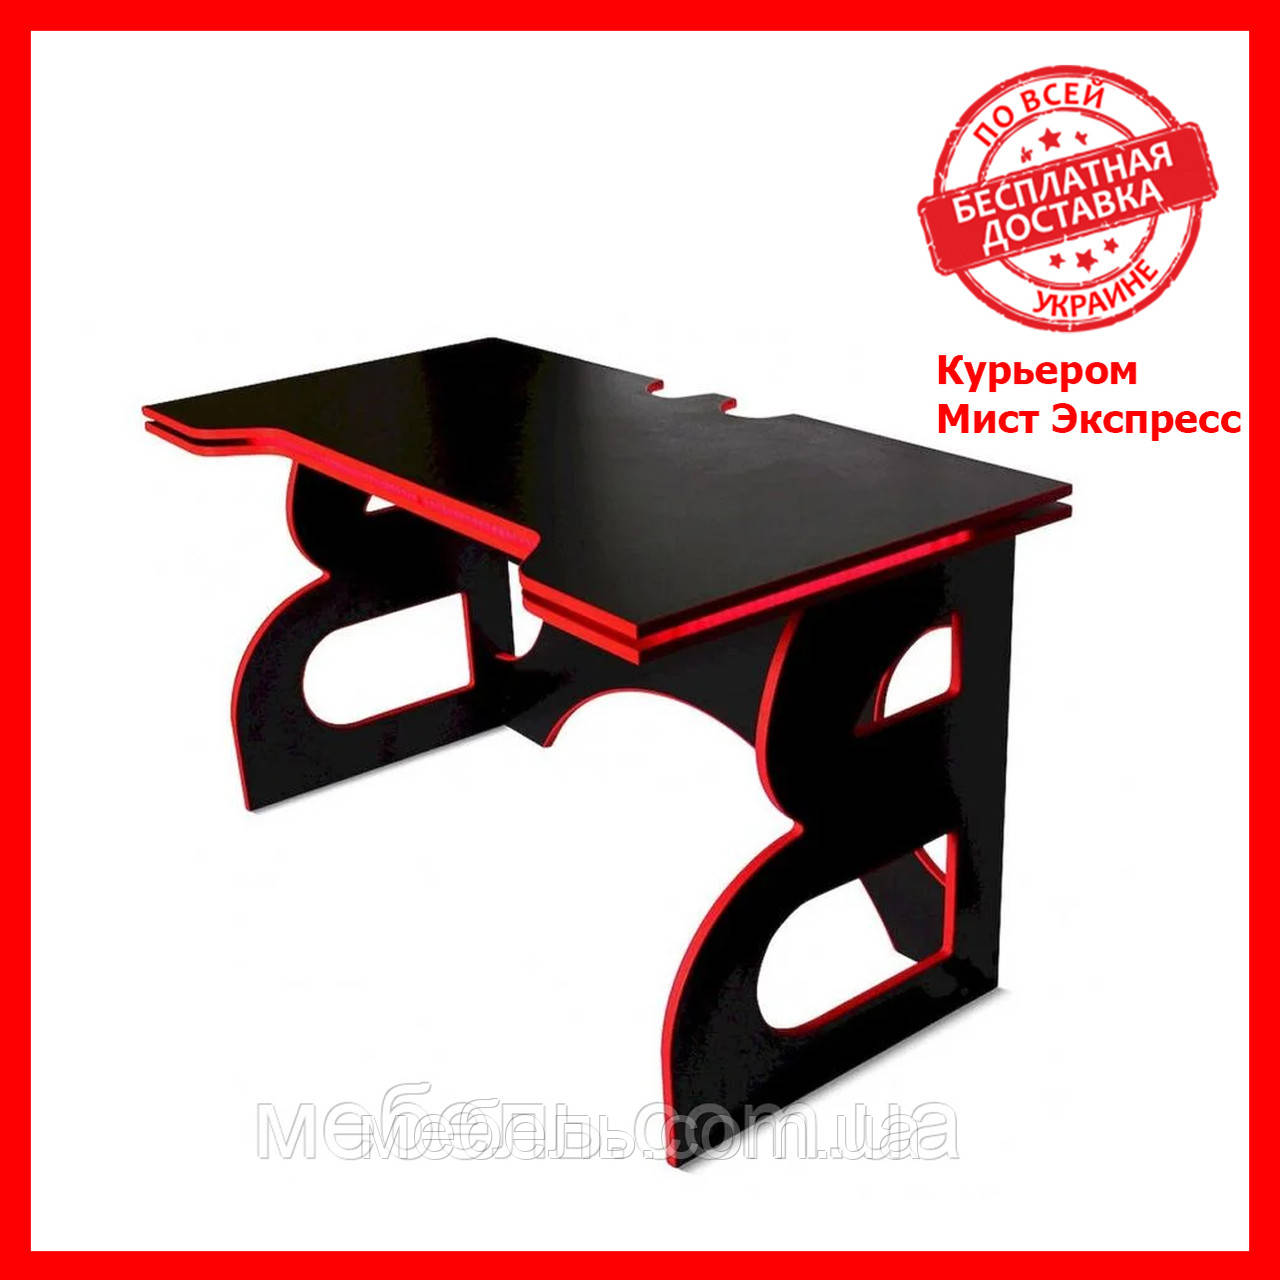 Компьютерный геймерский стол Barsky Homework Game Red HG-05 с полкой HG-05 /ПК-01 1400*700